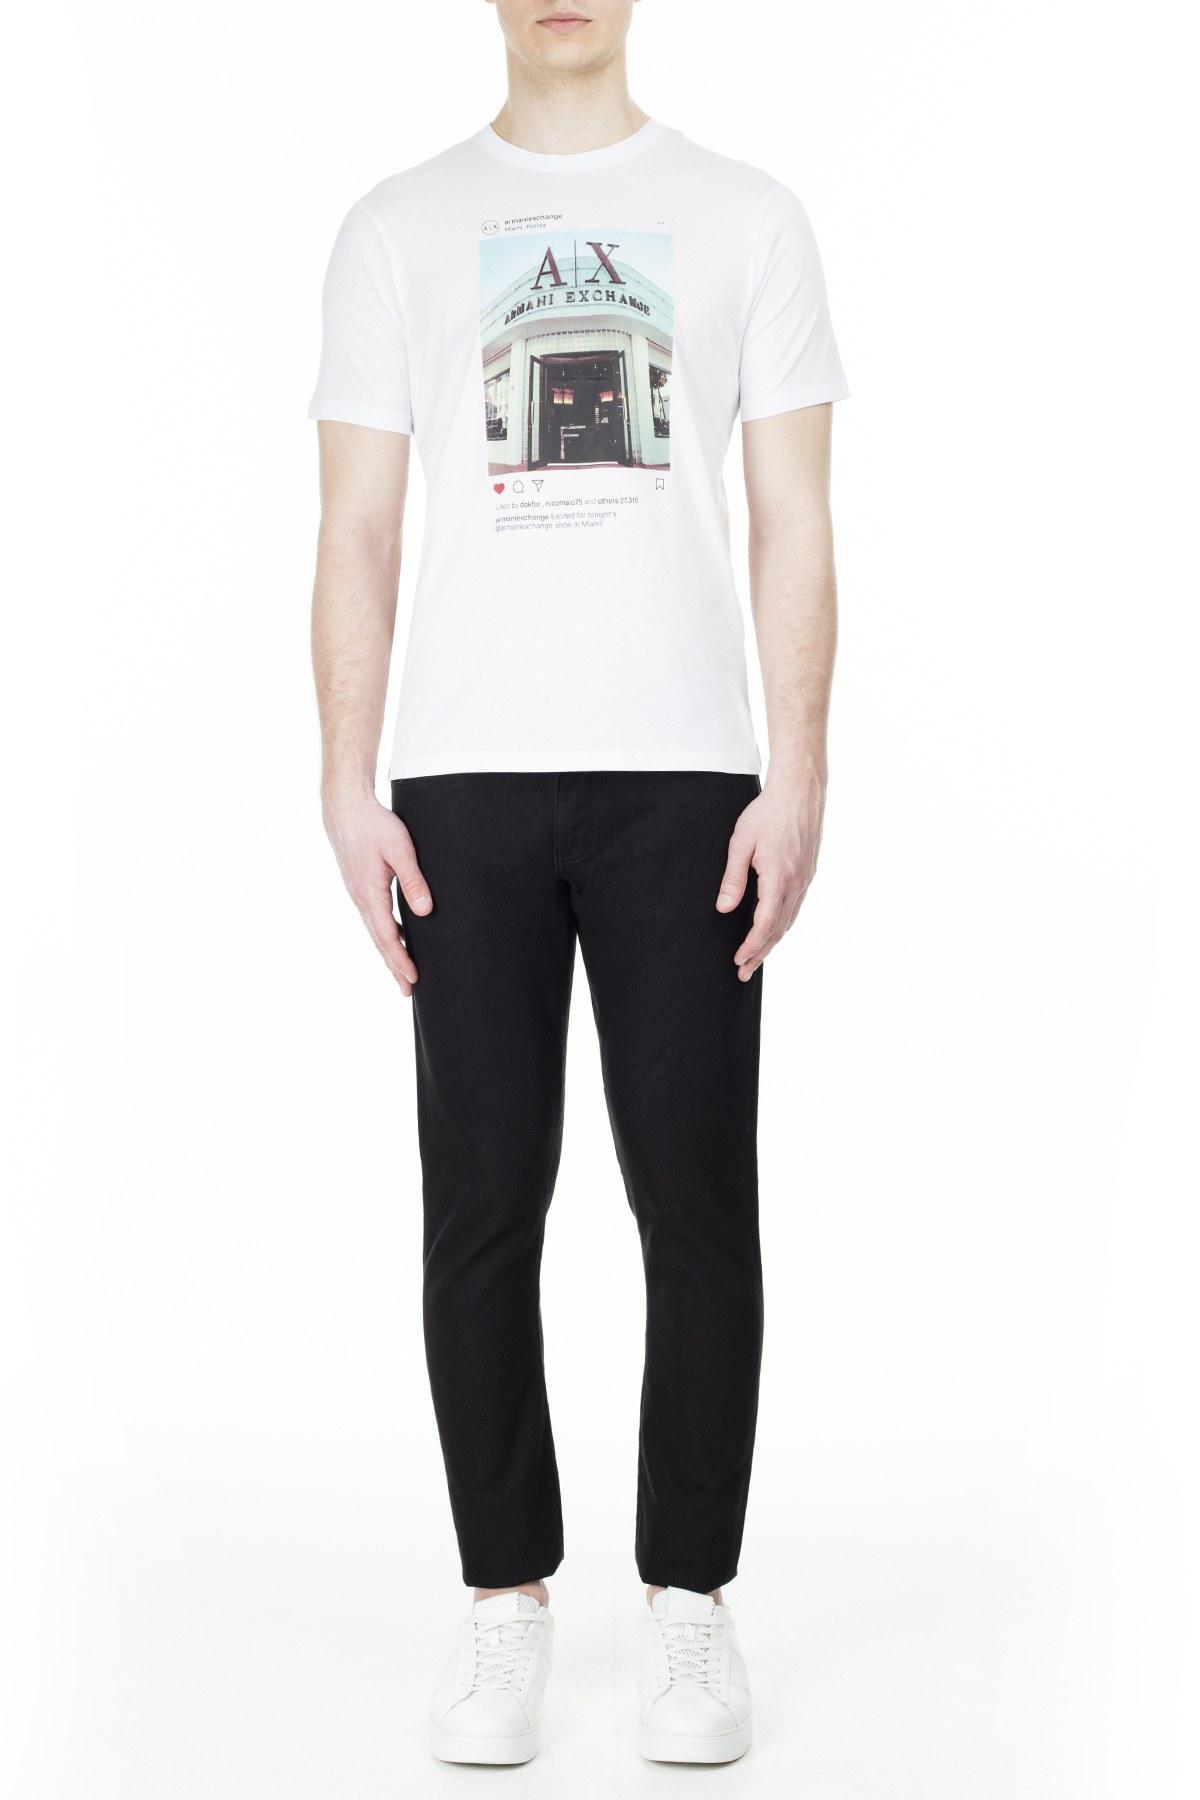 Armani Exchange Erkek T Shirt S 6GZTAX ZJH4Z 1100 BEYAZ